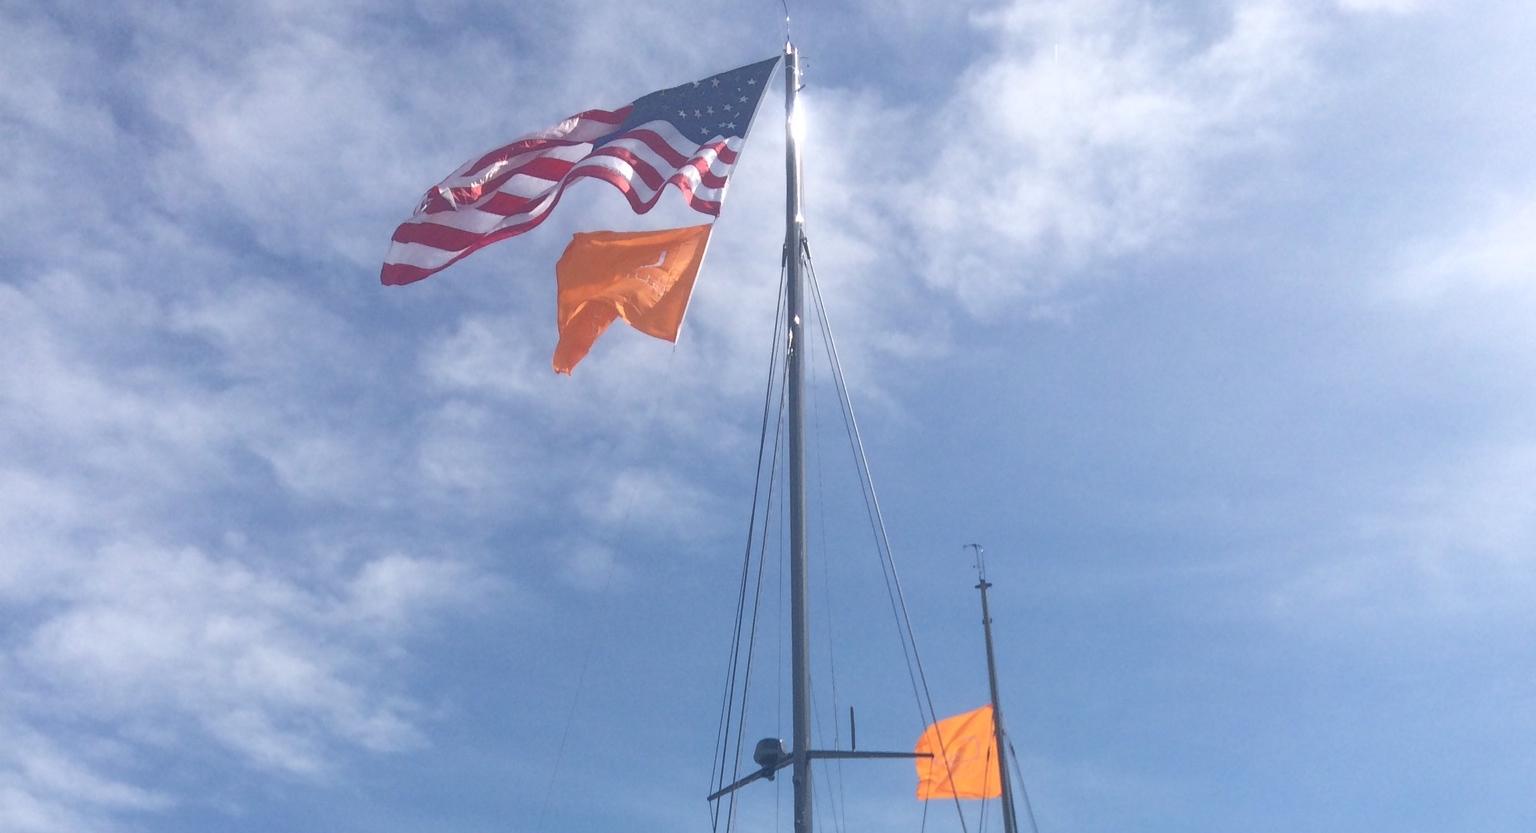 Annapolis Sail Boatshow 2014